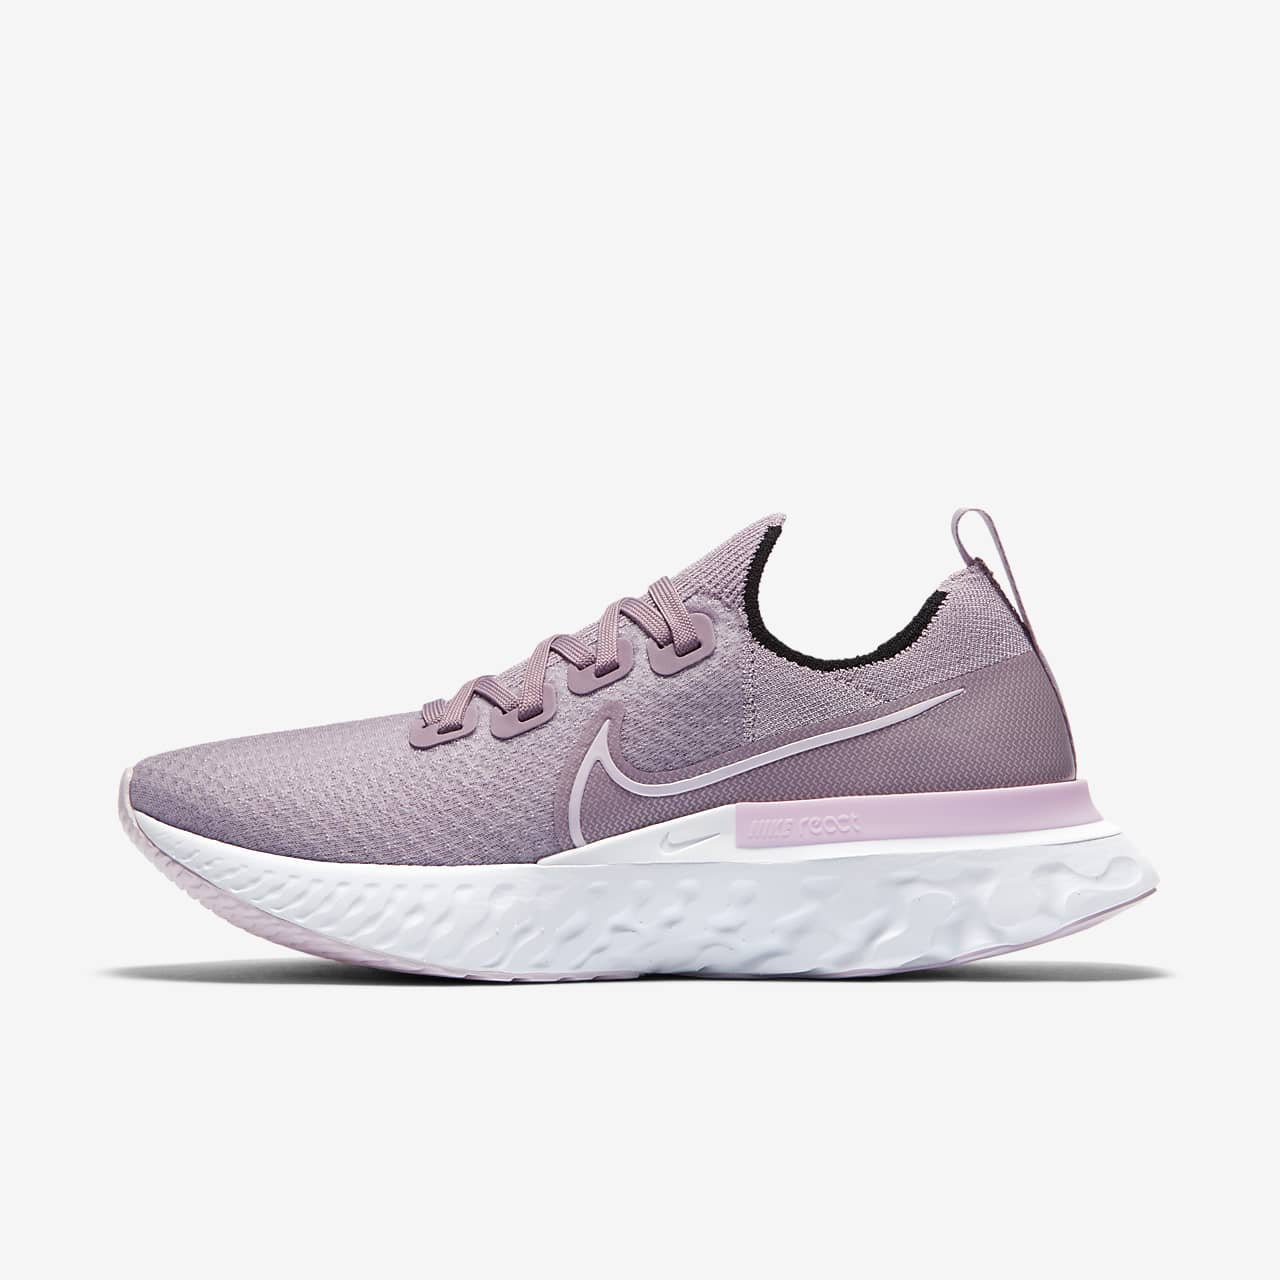 Respectivamente Aptitud pronto  Nike React Infinity Run Flyknit Women's Running Shoe. Nike ID